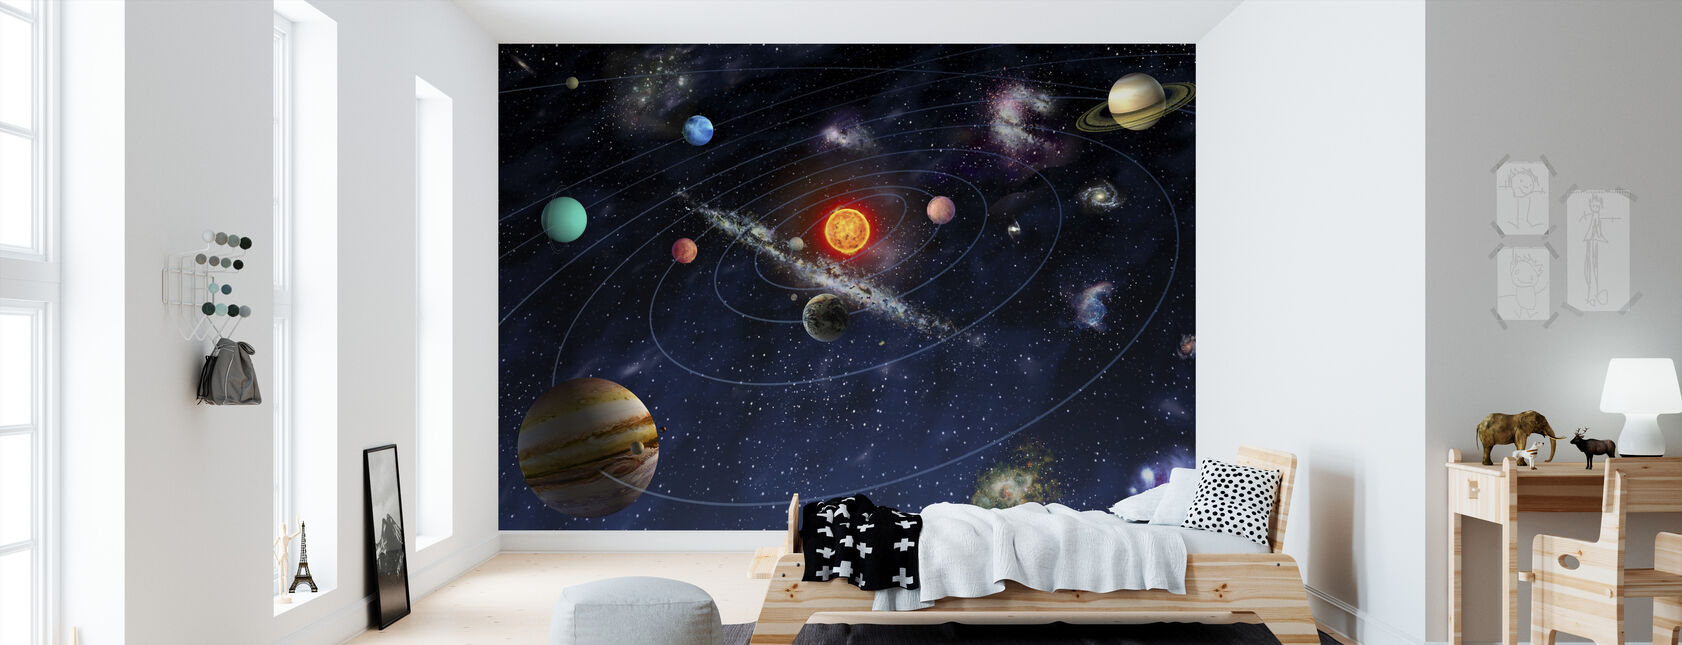 Deco Chambre Garcon Theme Espace